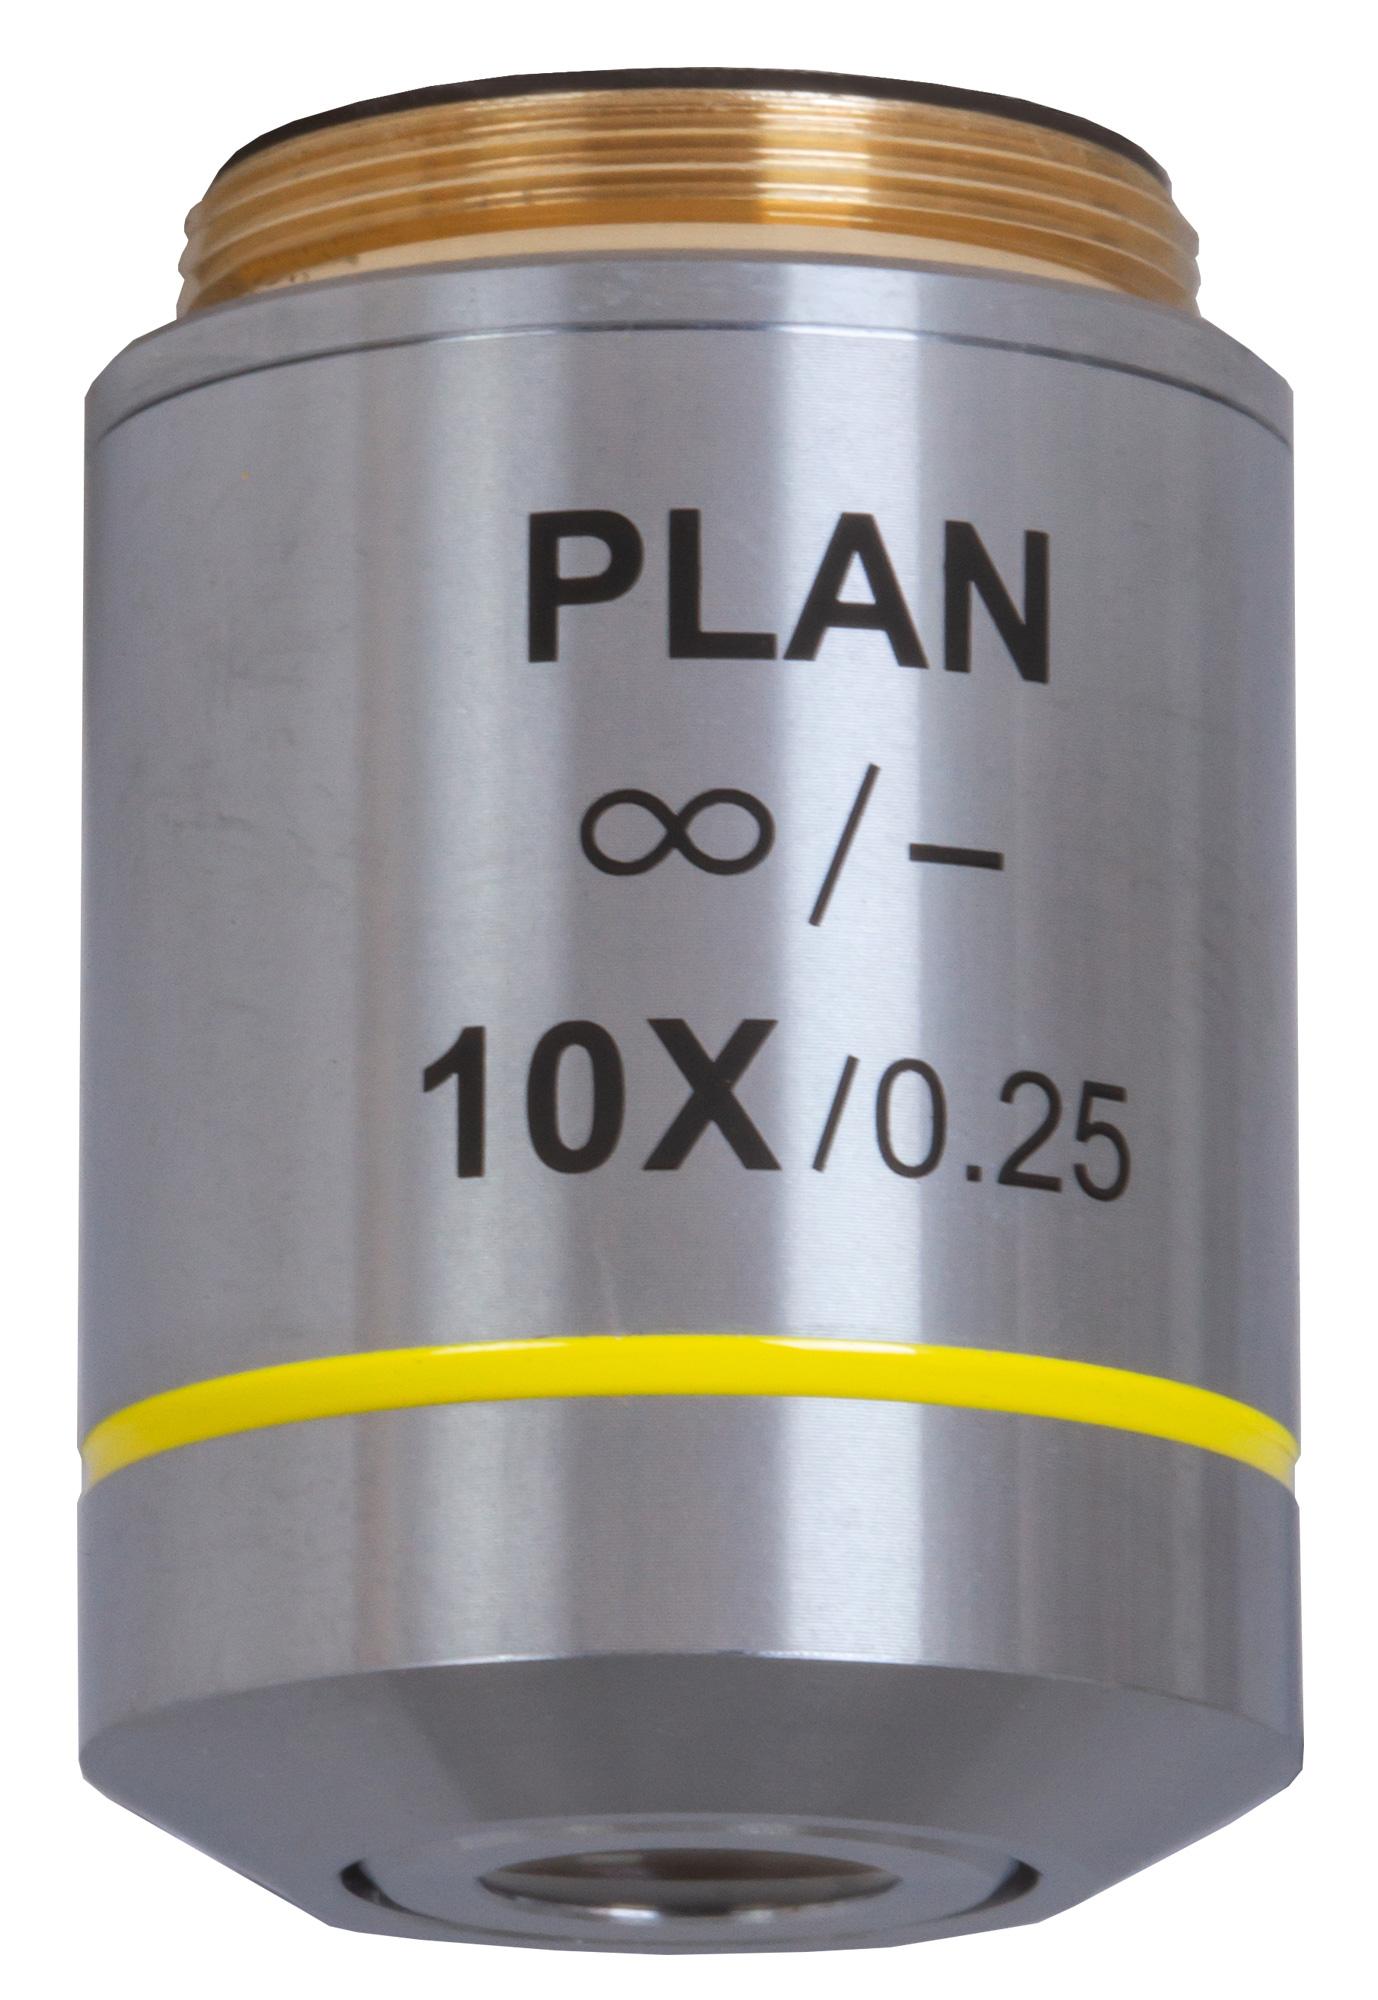 Объектив планахроматический Levenhuk (Левенгук) MED 10x/беск фото